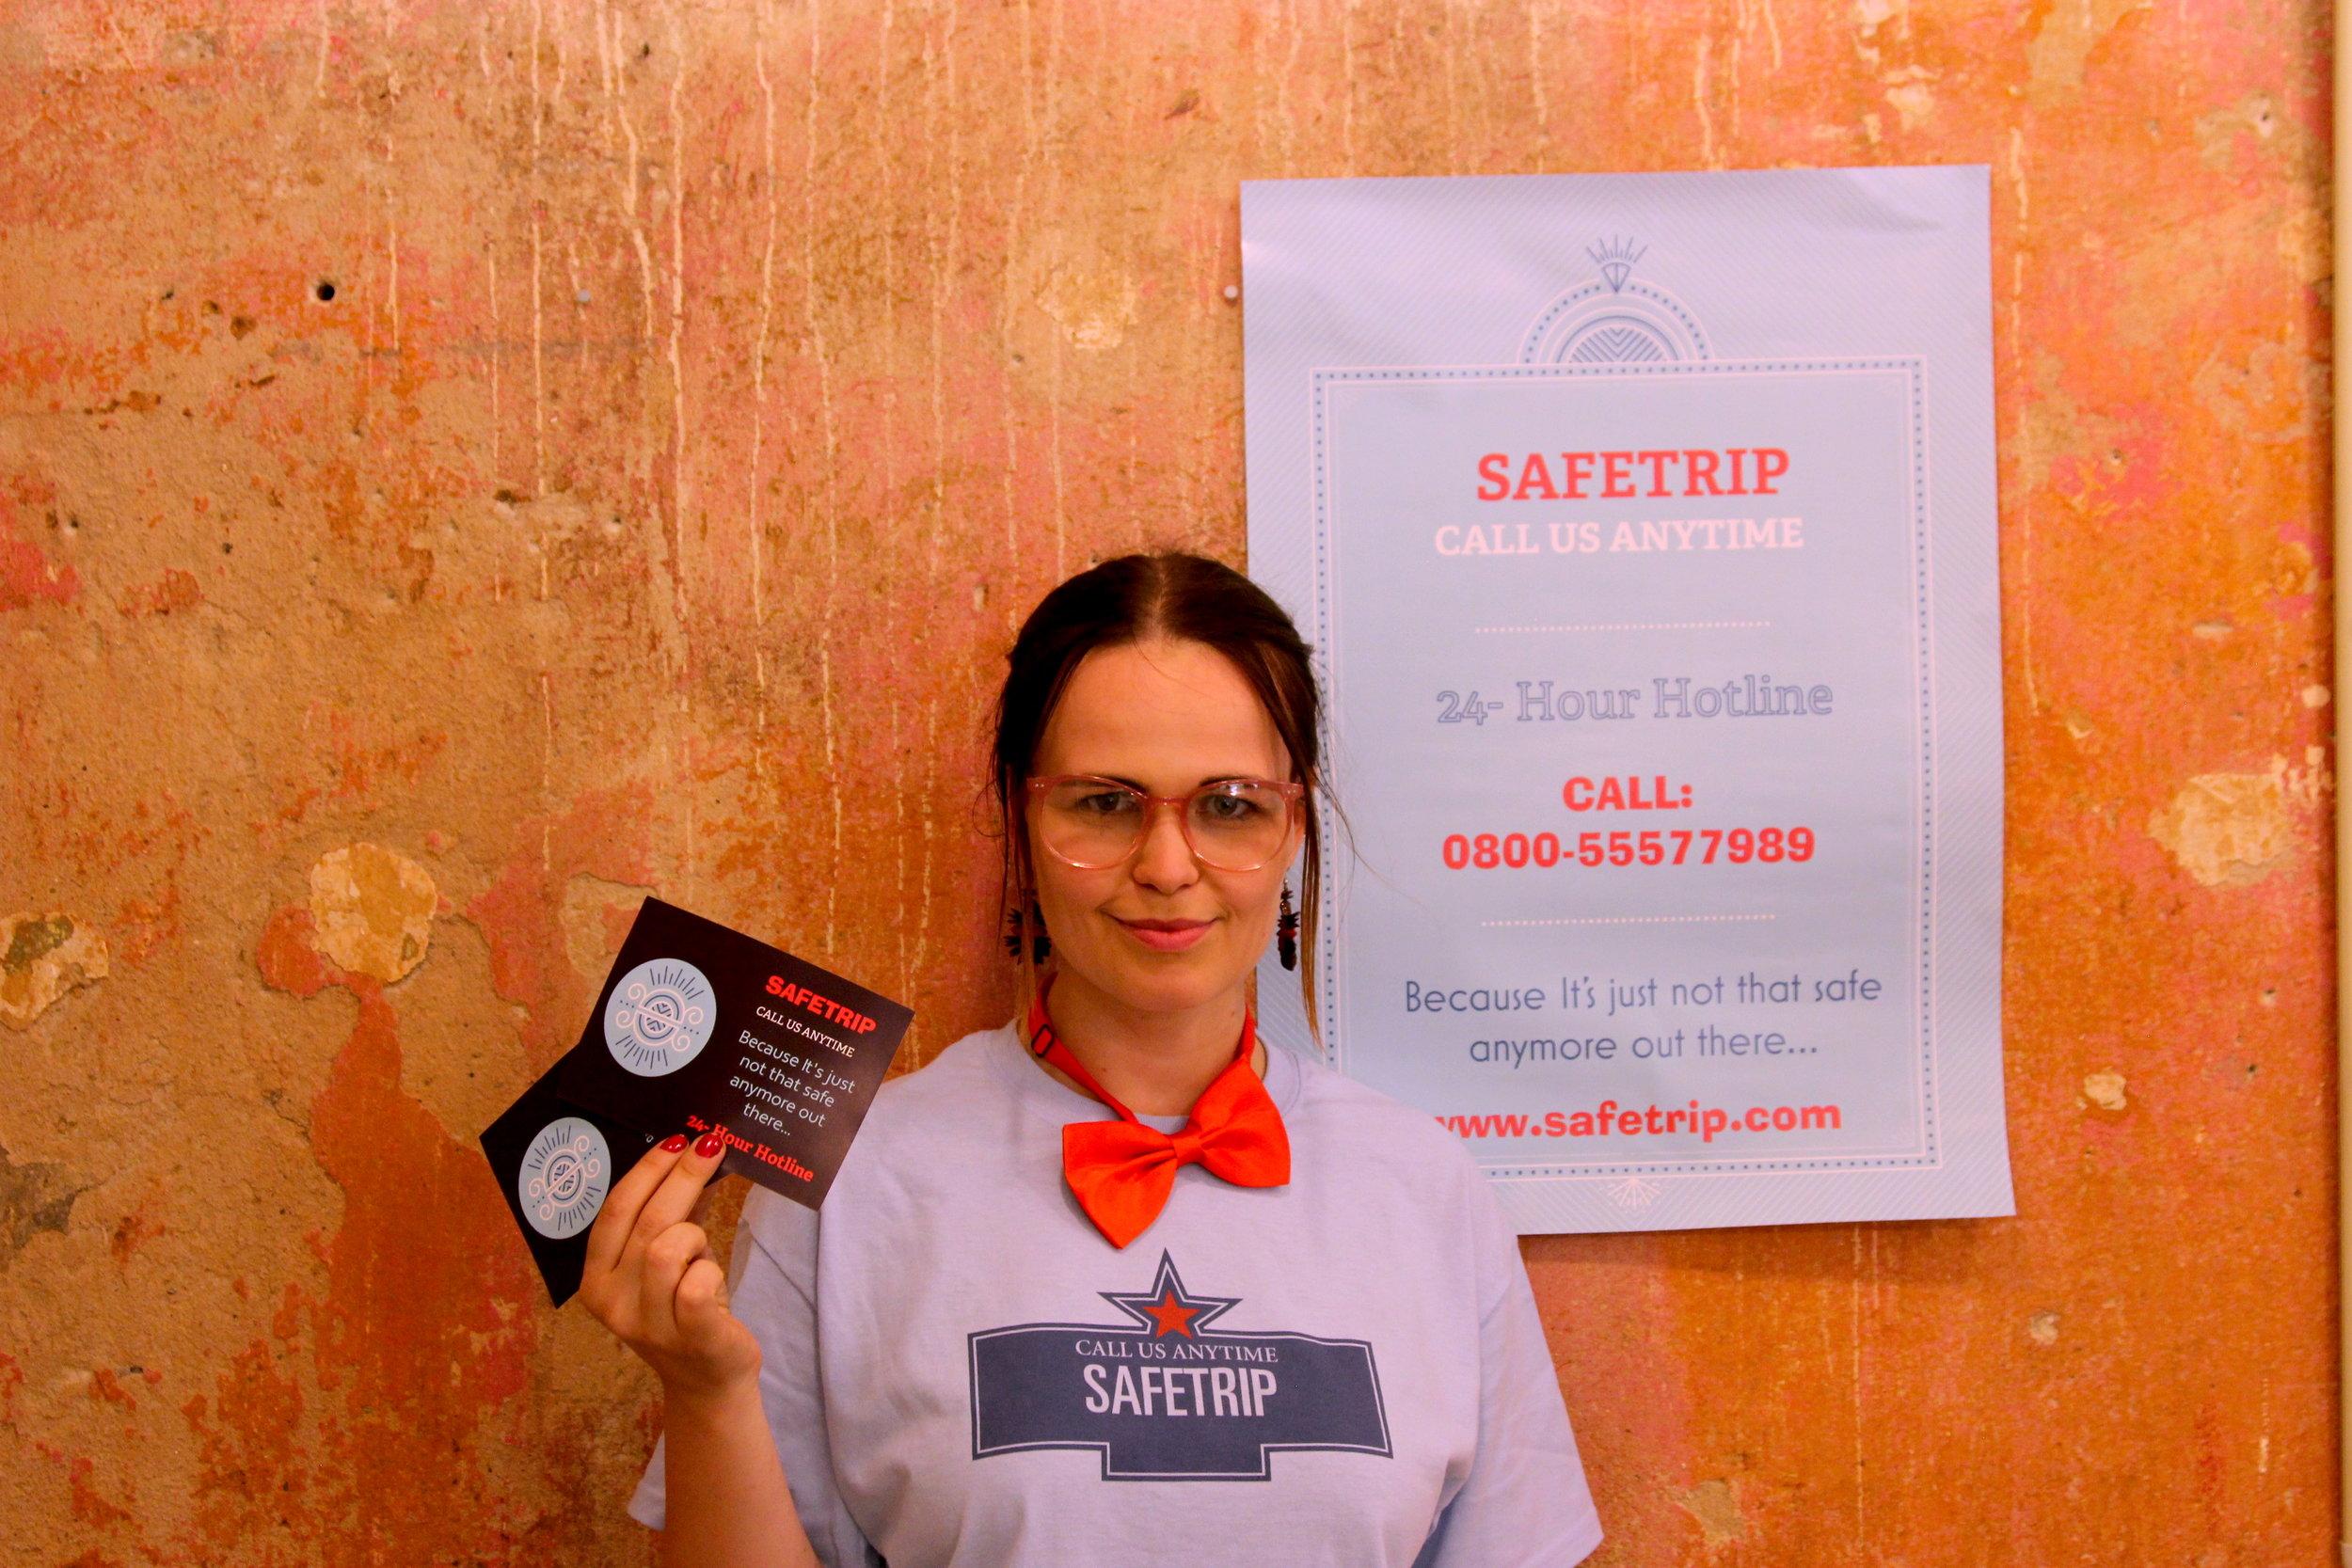 Safetrip_Natalie2.jpg